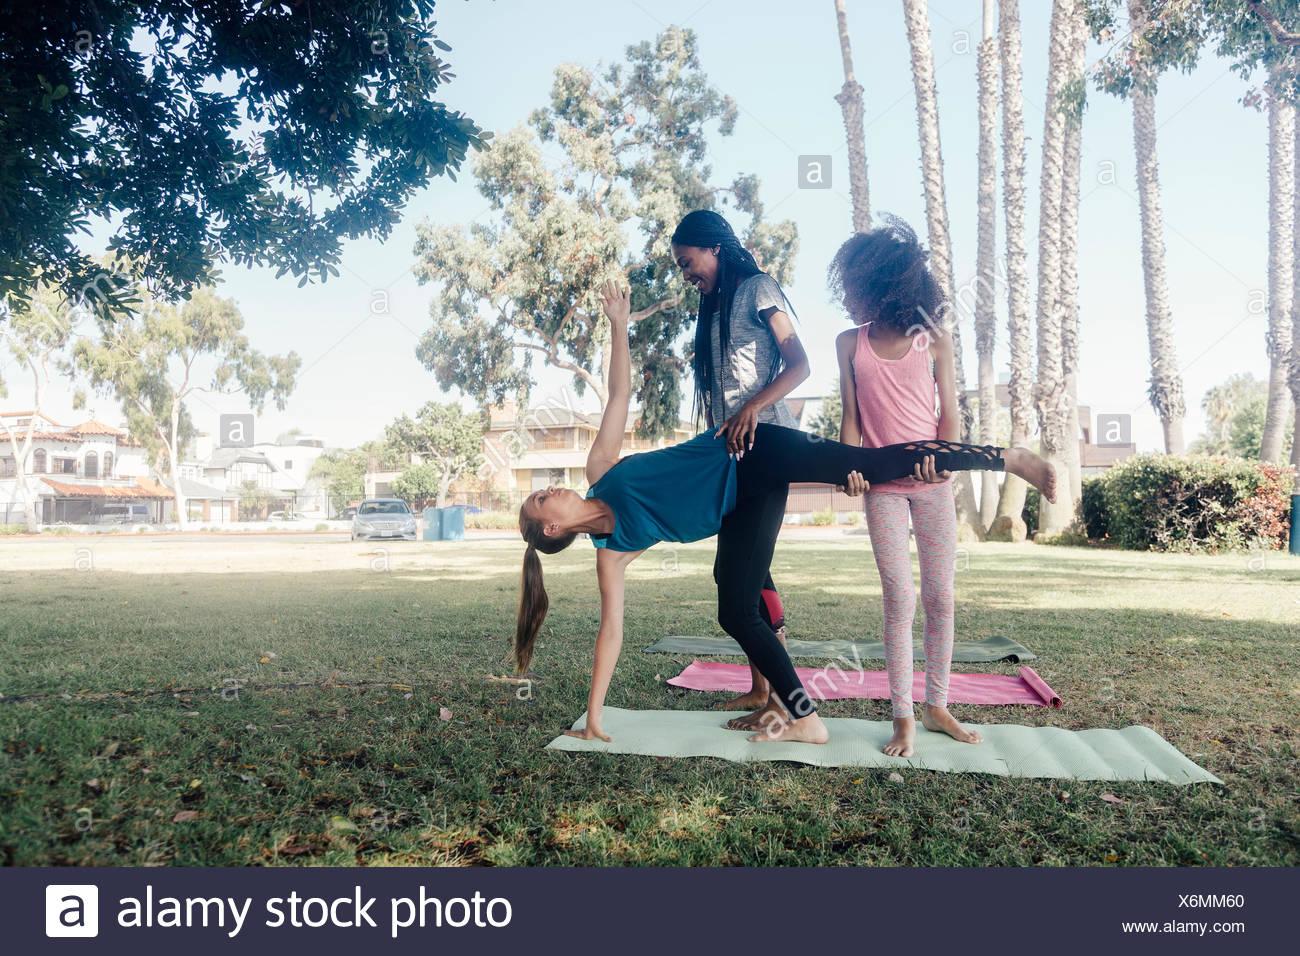 Girls and teenage schoolgirls practicing yoga standing half moon pose on school playing field - Stock Image